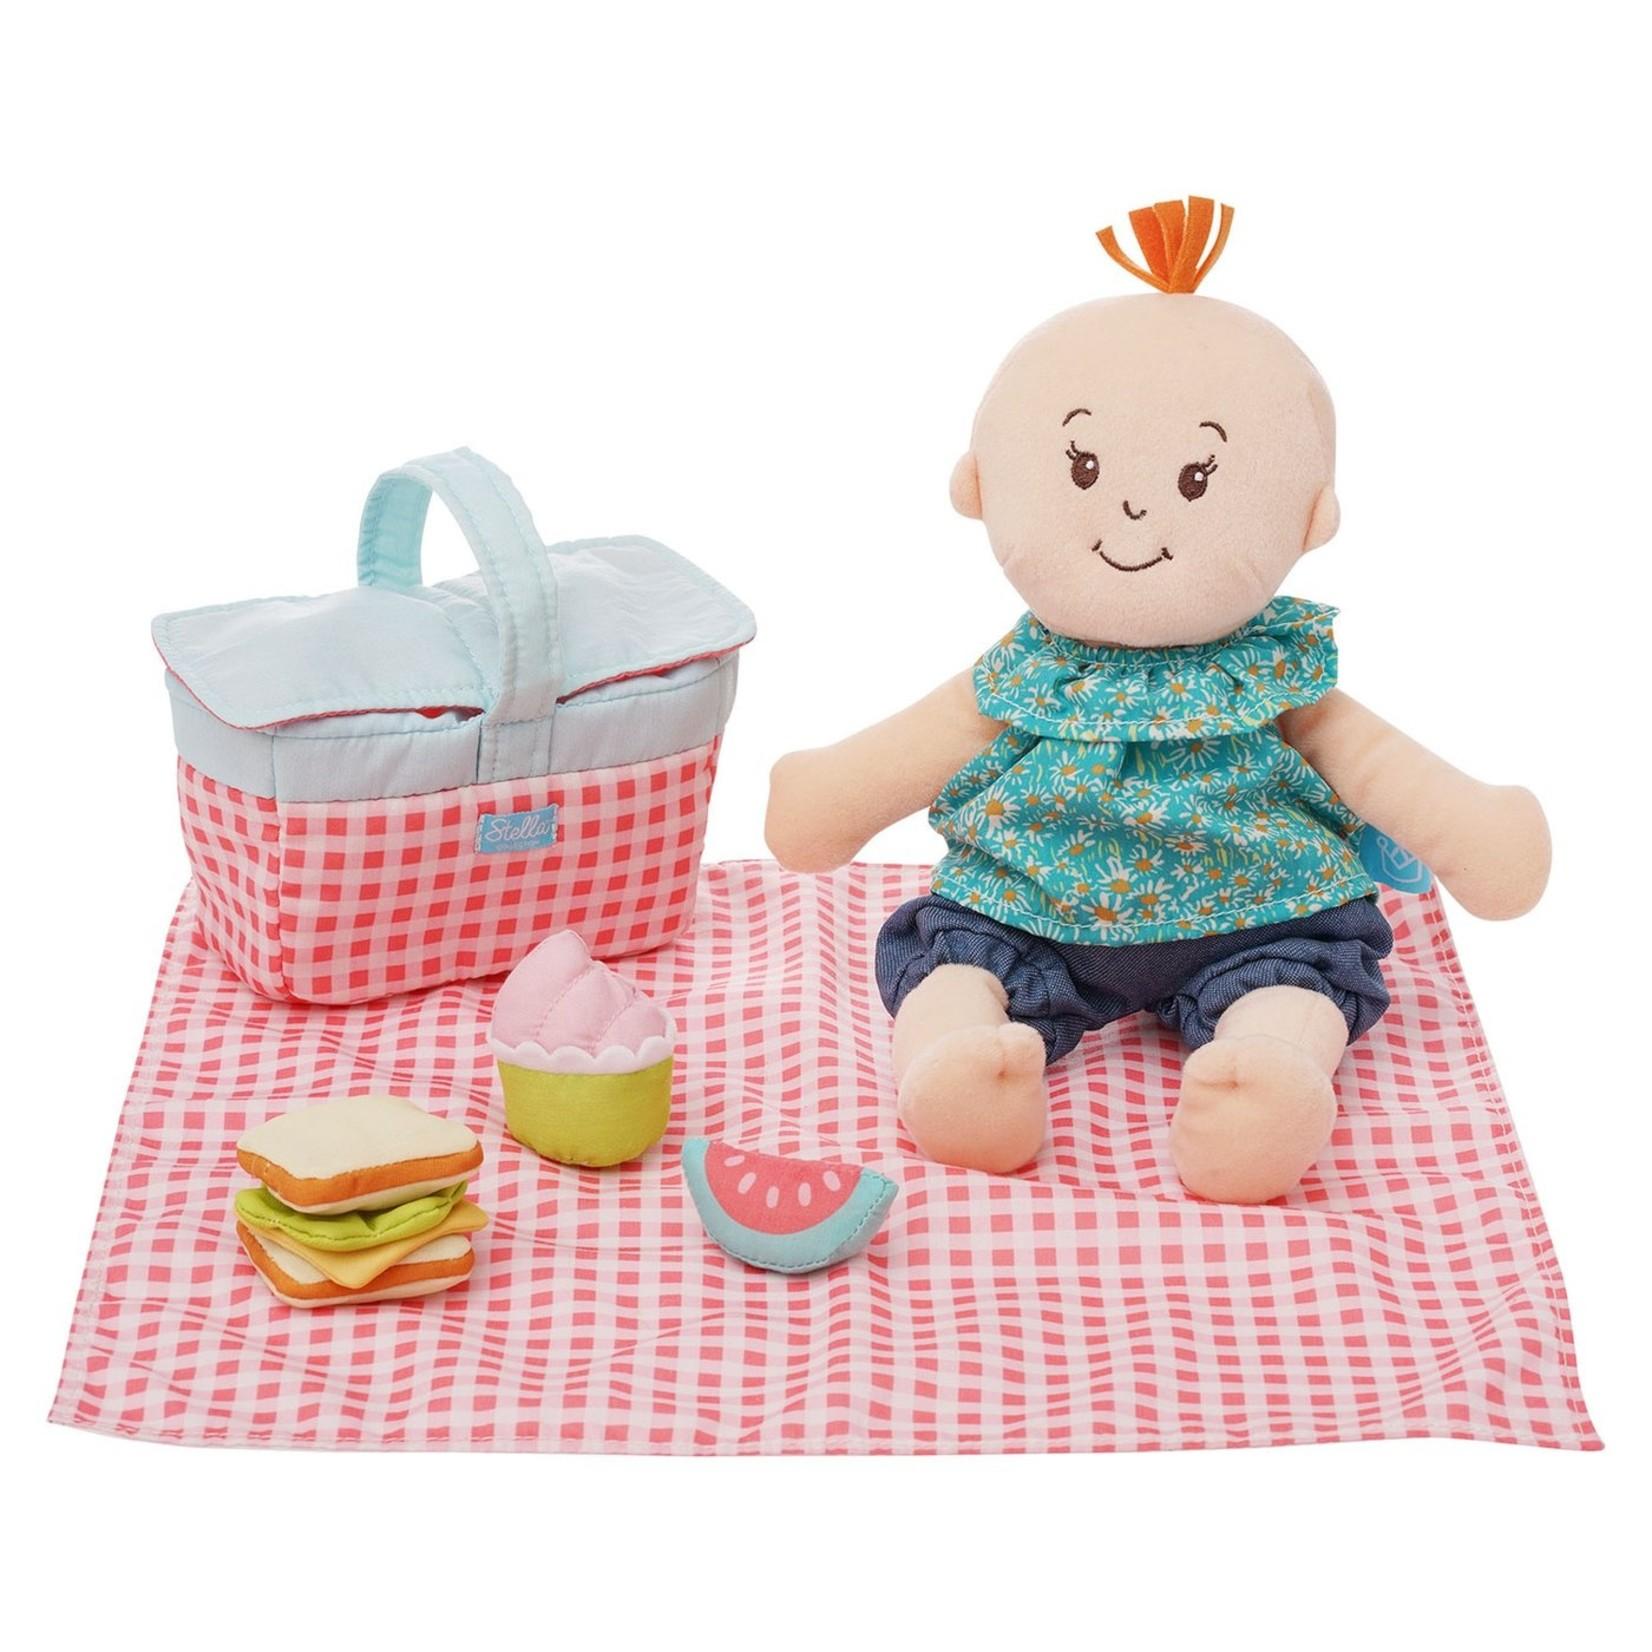 Manhattan Toy Stella Collection - Picnic